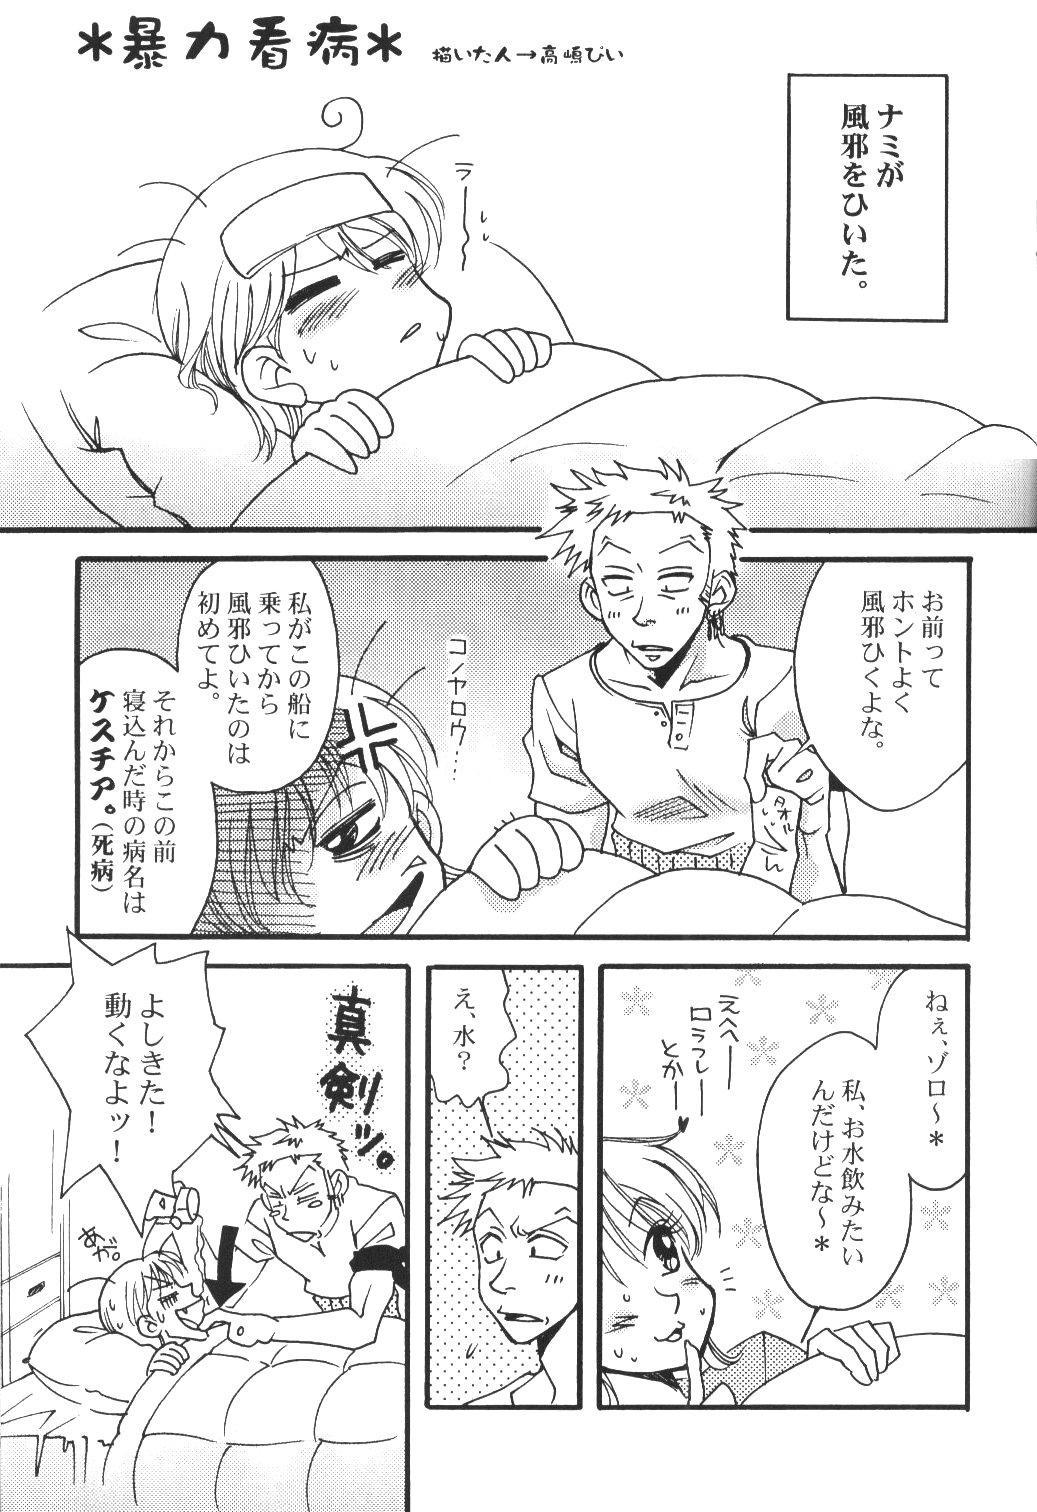 Yume Ichiya 2 39